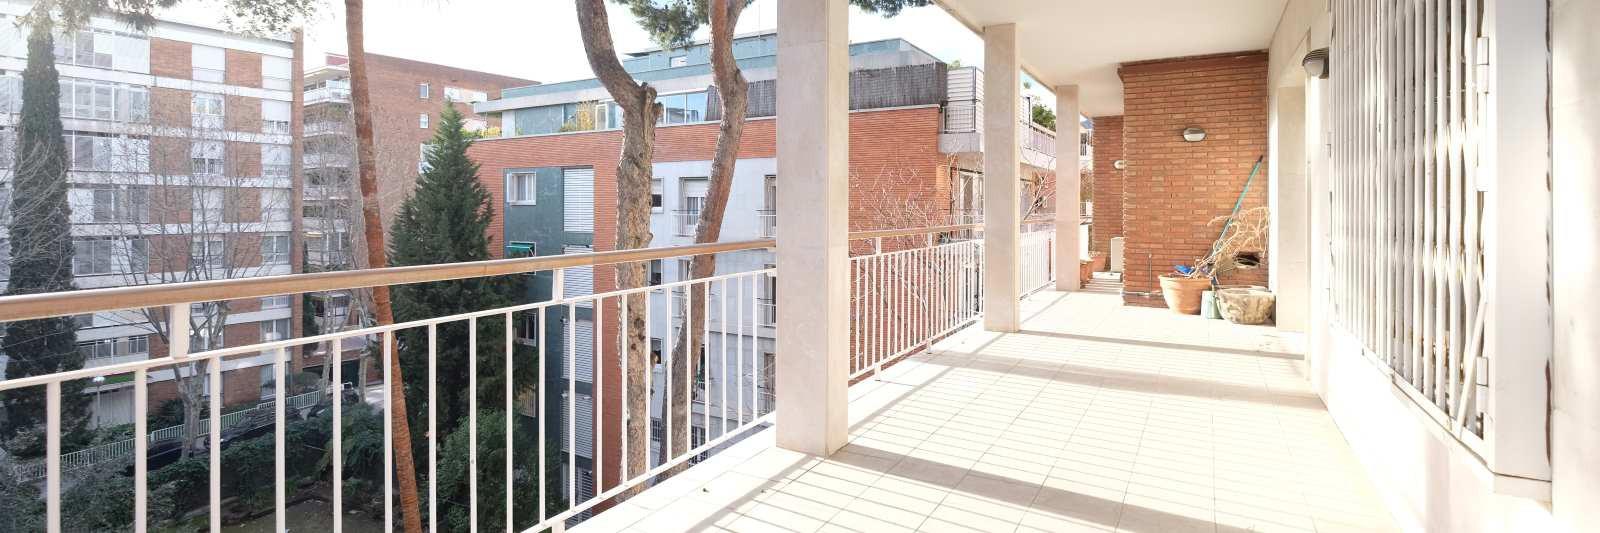 MG Inmobiliaria Barcelona - epiesjbenavente